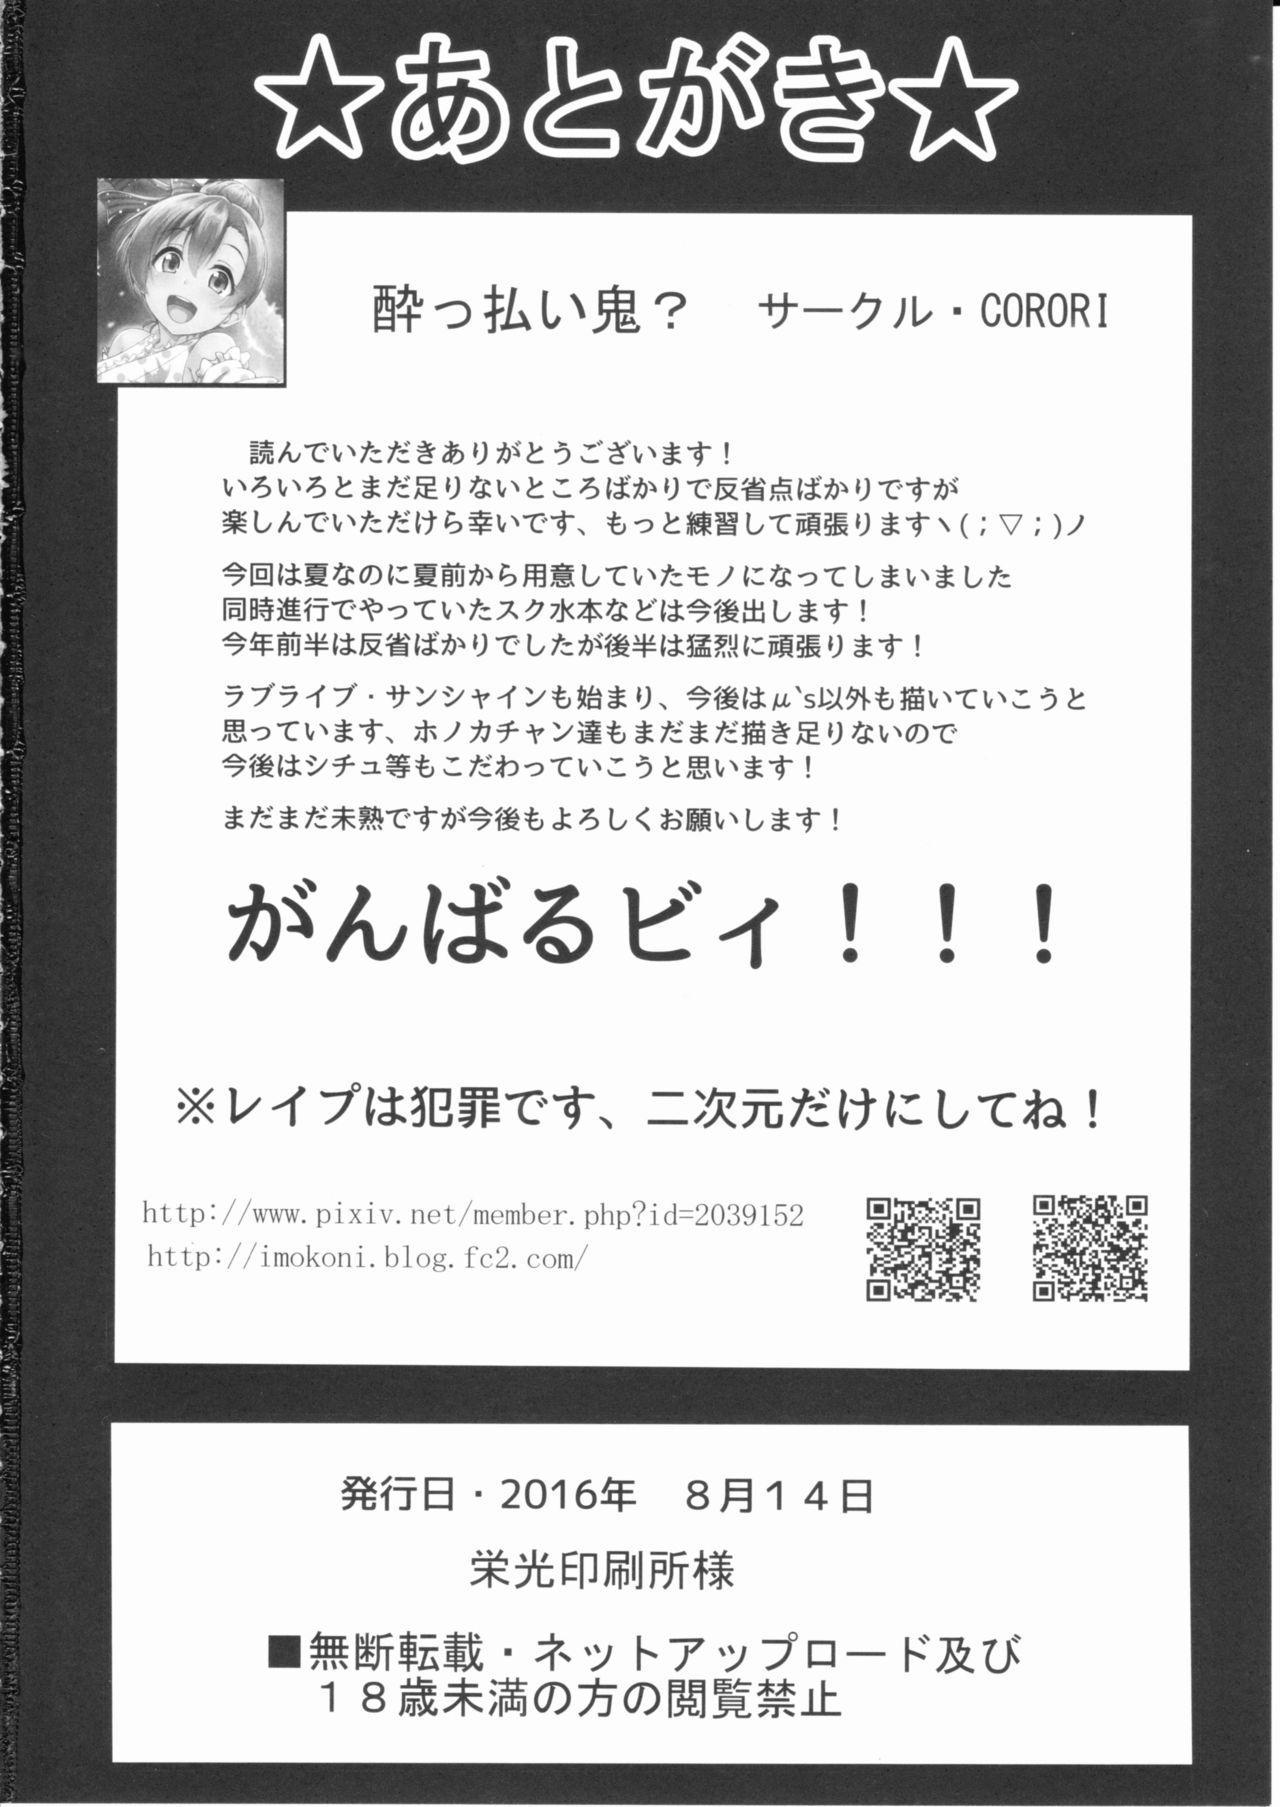 (C90) [corori (Yopparai Oni?)] HONOKAN ~ Damasare ~ Dokonimo nige rarenai ~! (Love Live!) 44